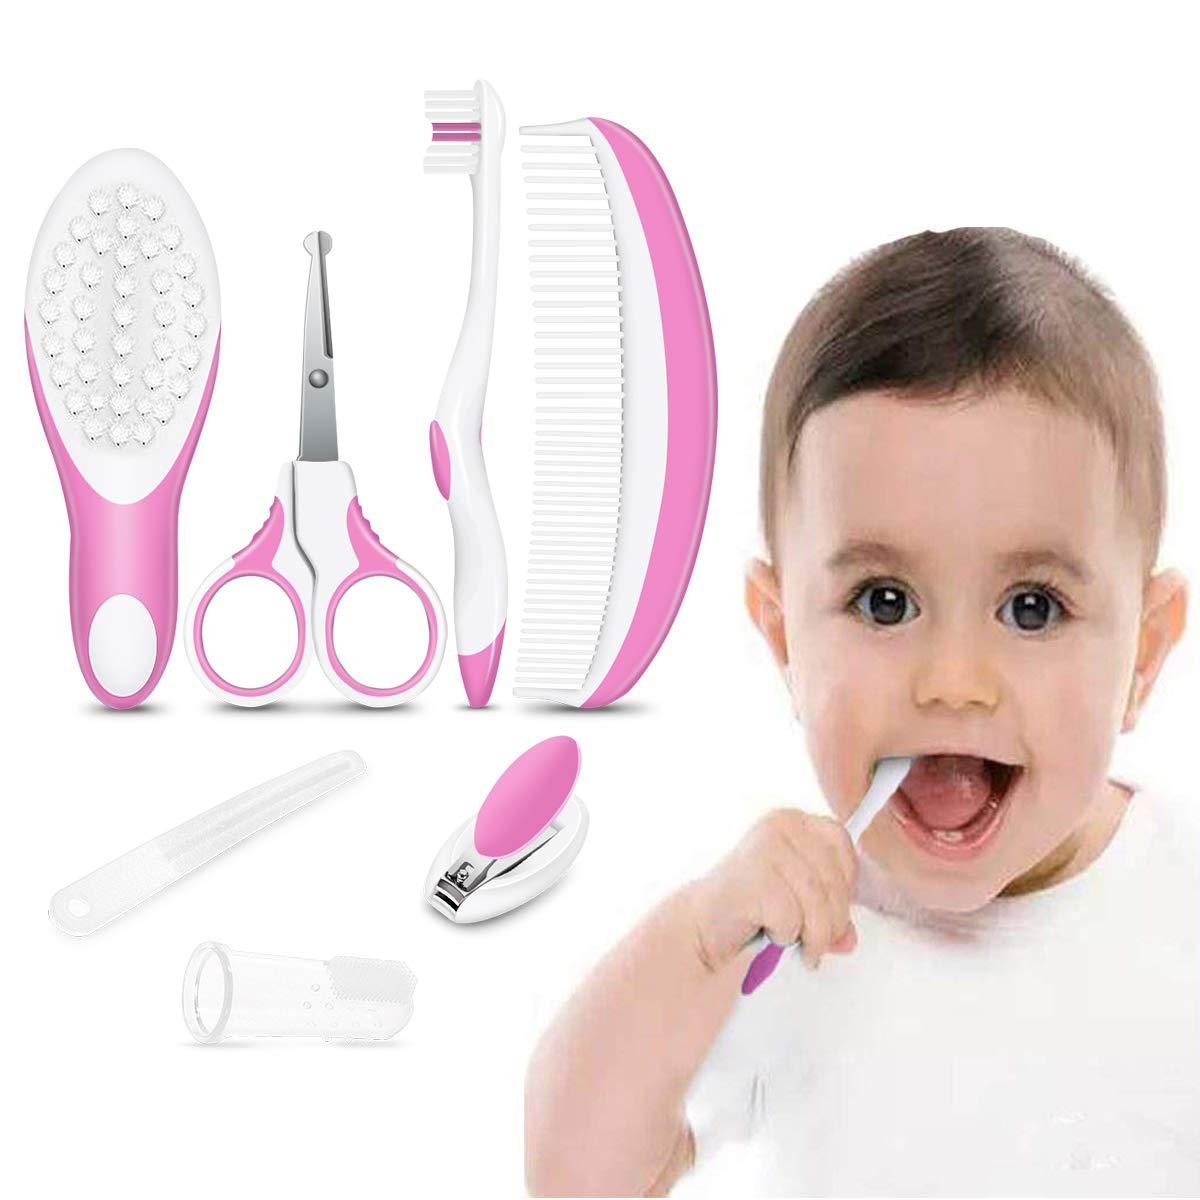 iRegro Baby Grooming Set, Healthcare Kit - 7-Piece Baby Grooming Kit Set (pink)